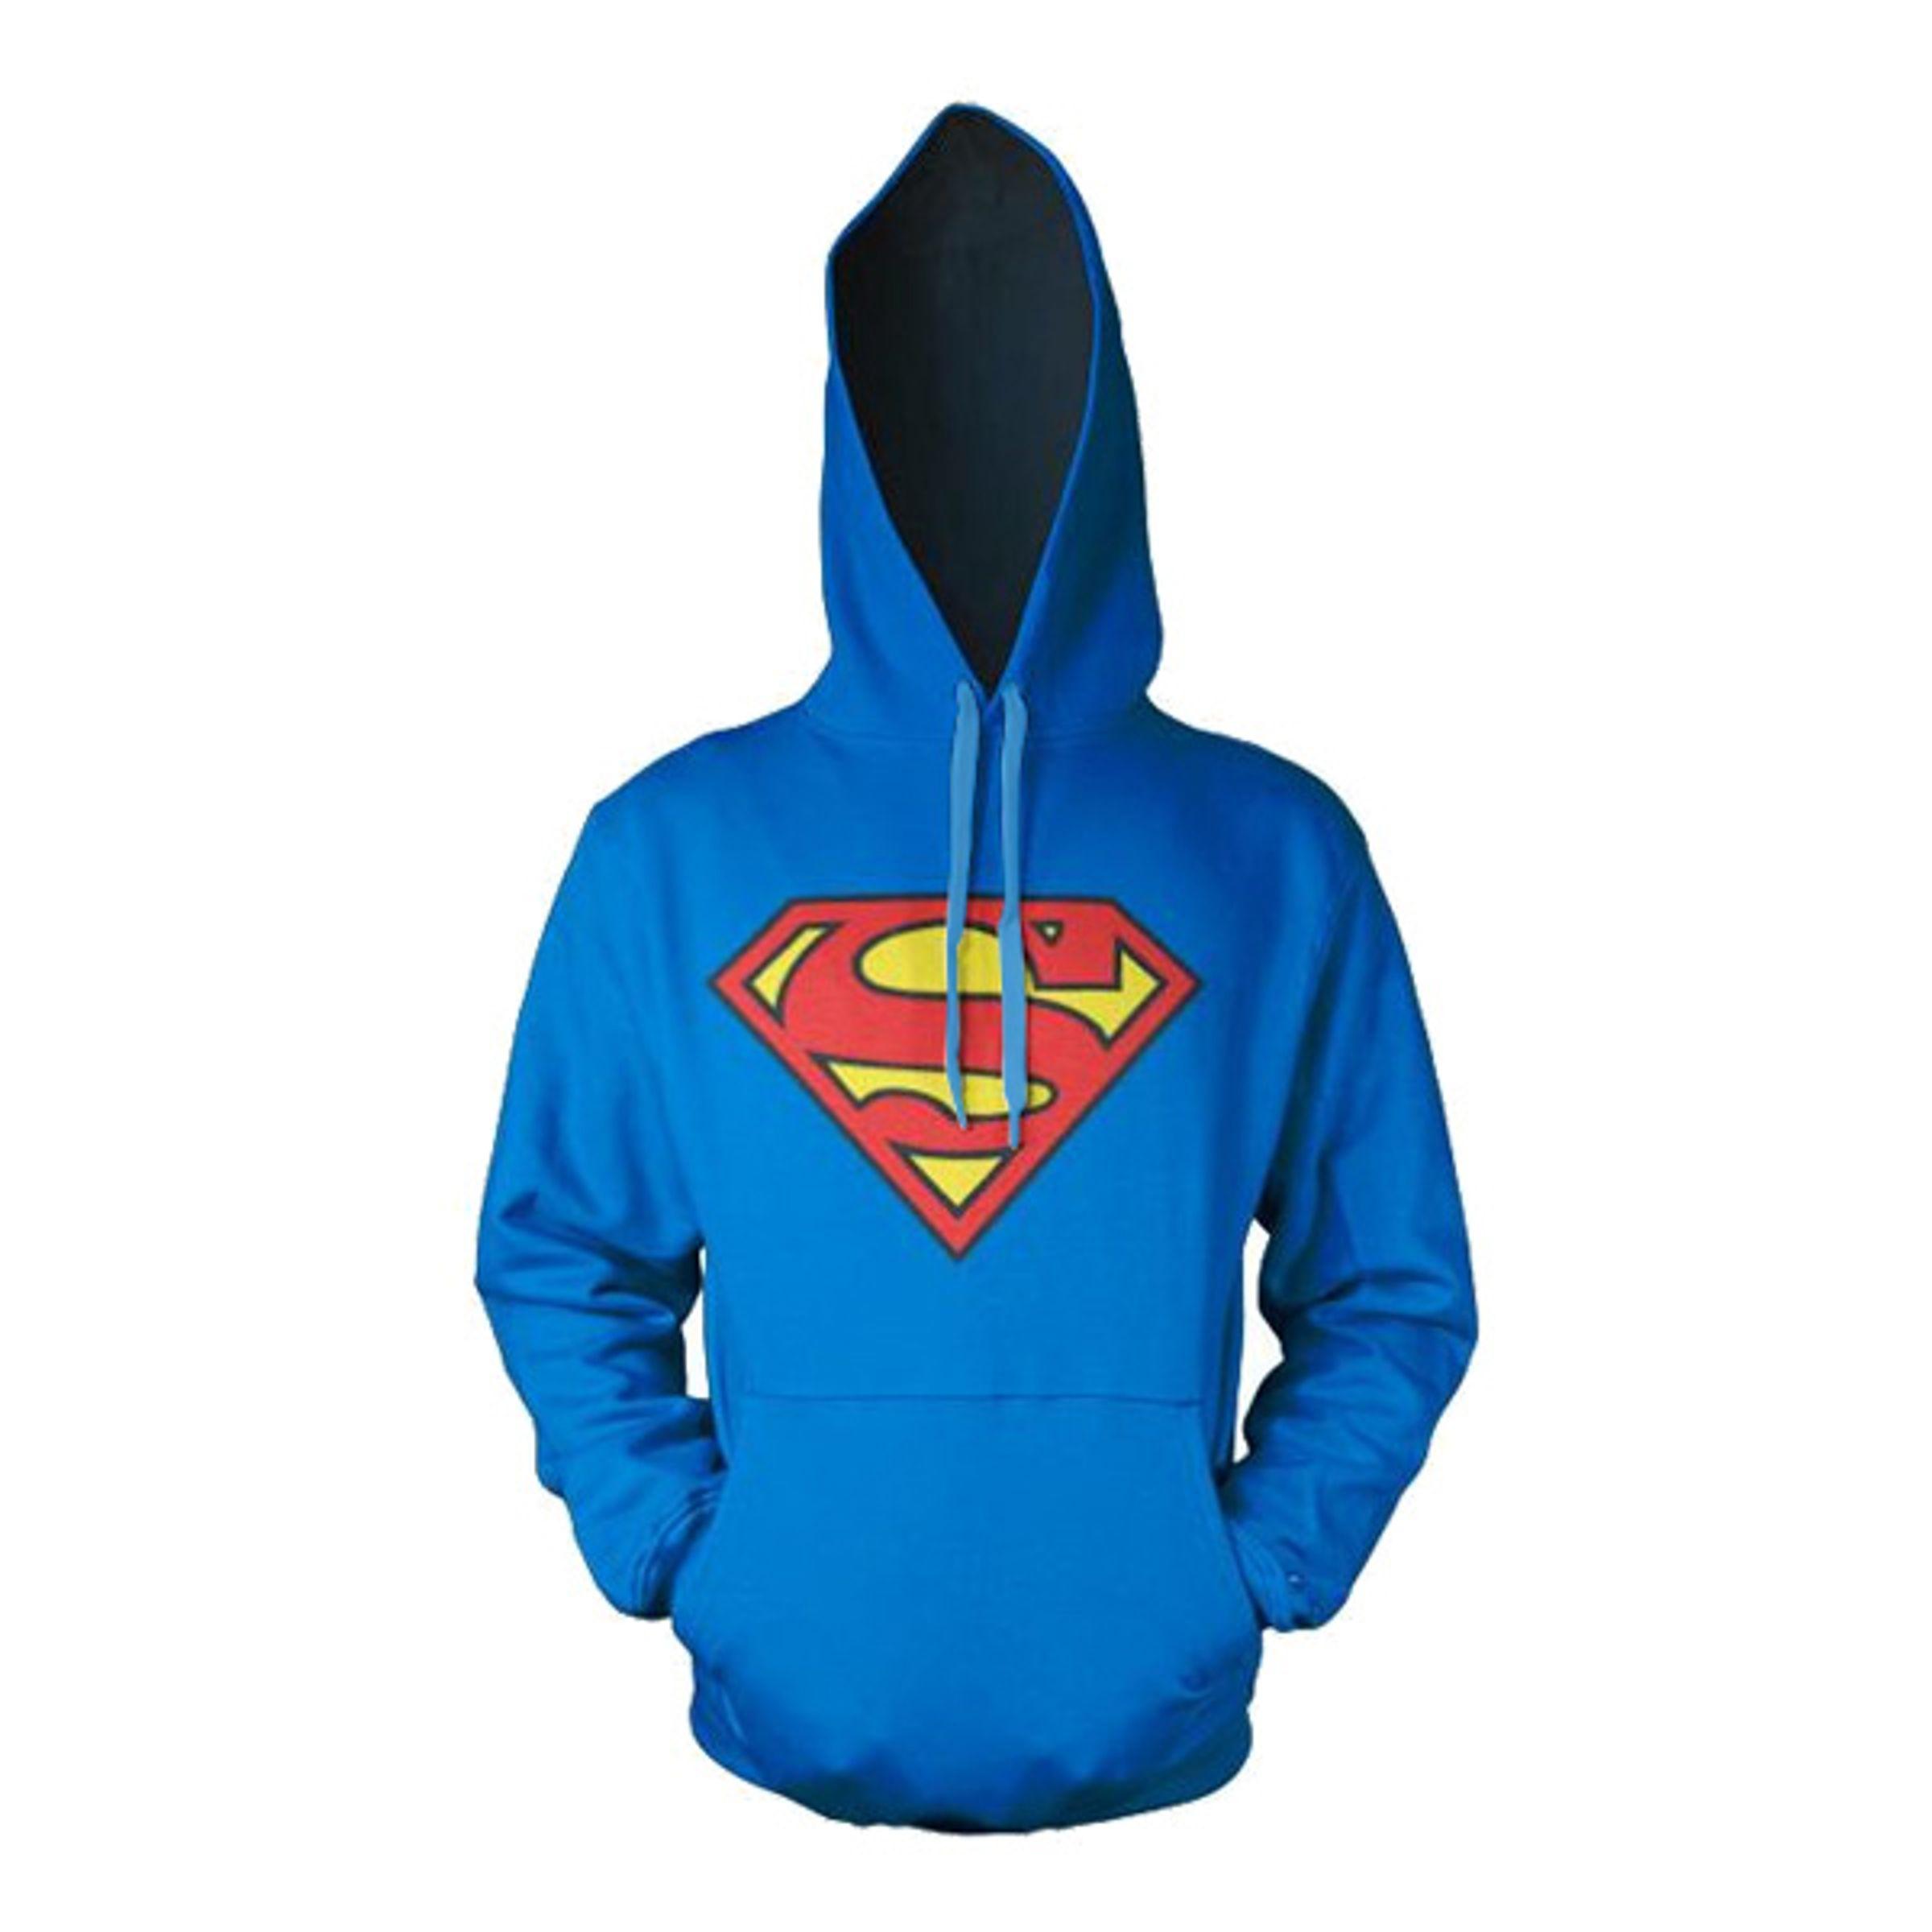 Superman Hoodie - Small